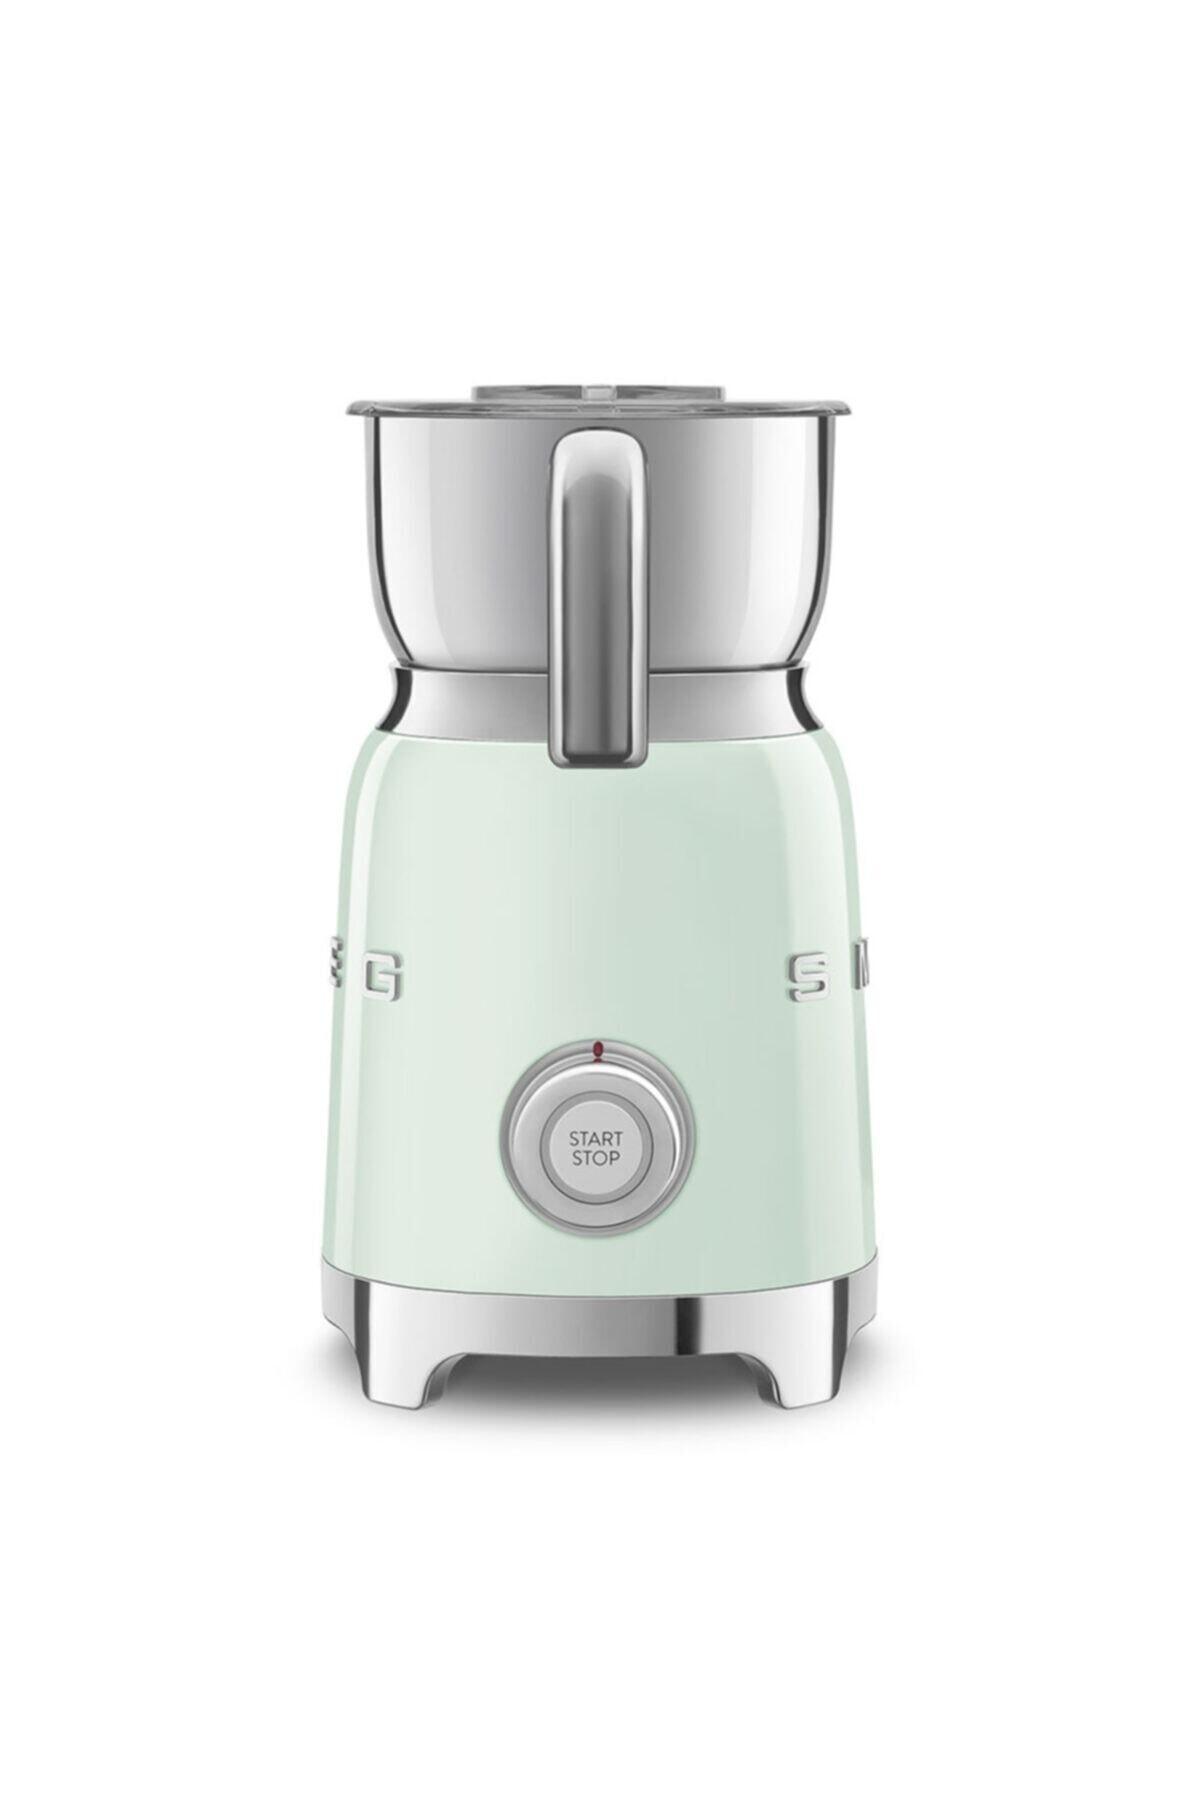 SMEG Mff01pgeu Süt Köpürtme Makinesi Pastel Yeşil 2